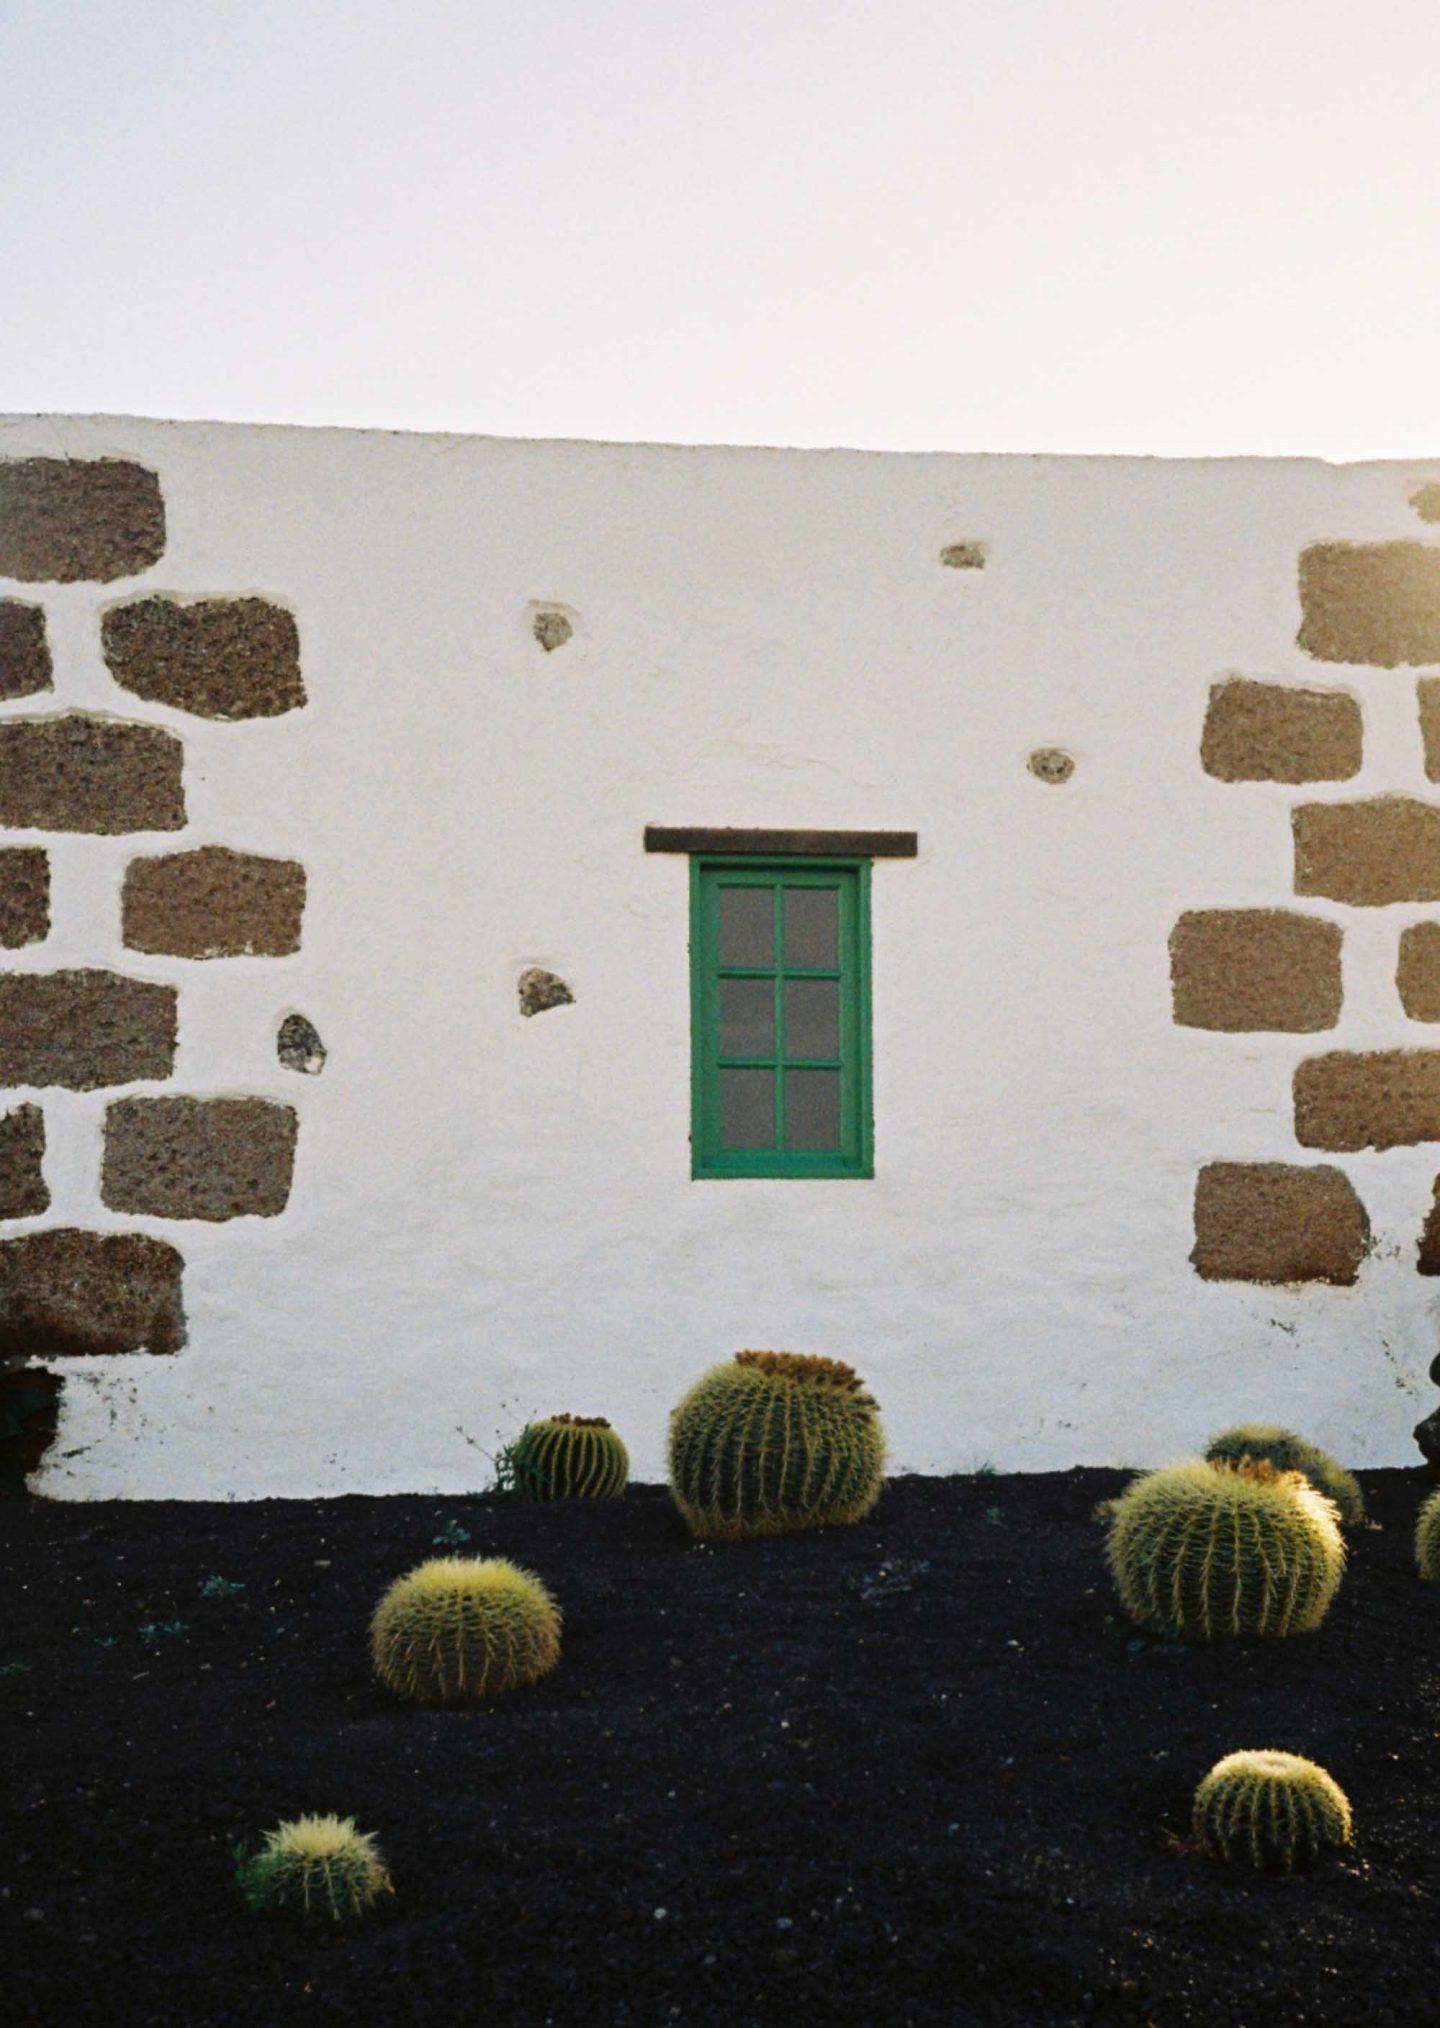 IGNANT-Photography-Arturo-Bamboo-Lanzarote-6